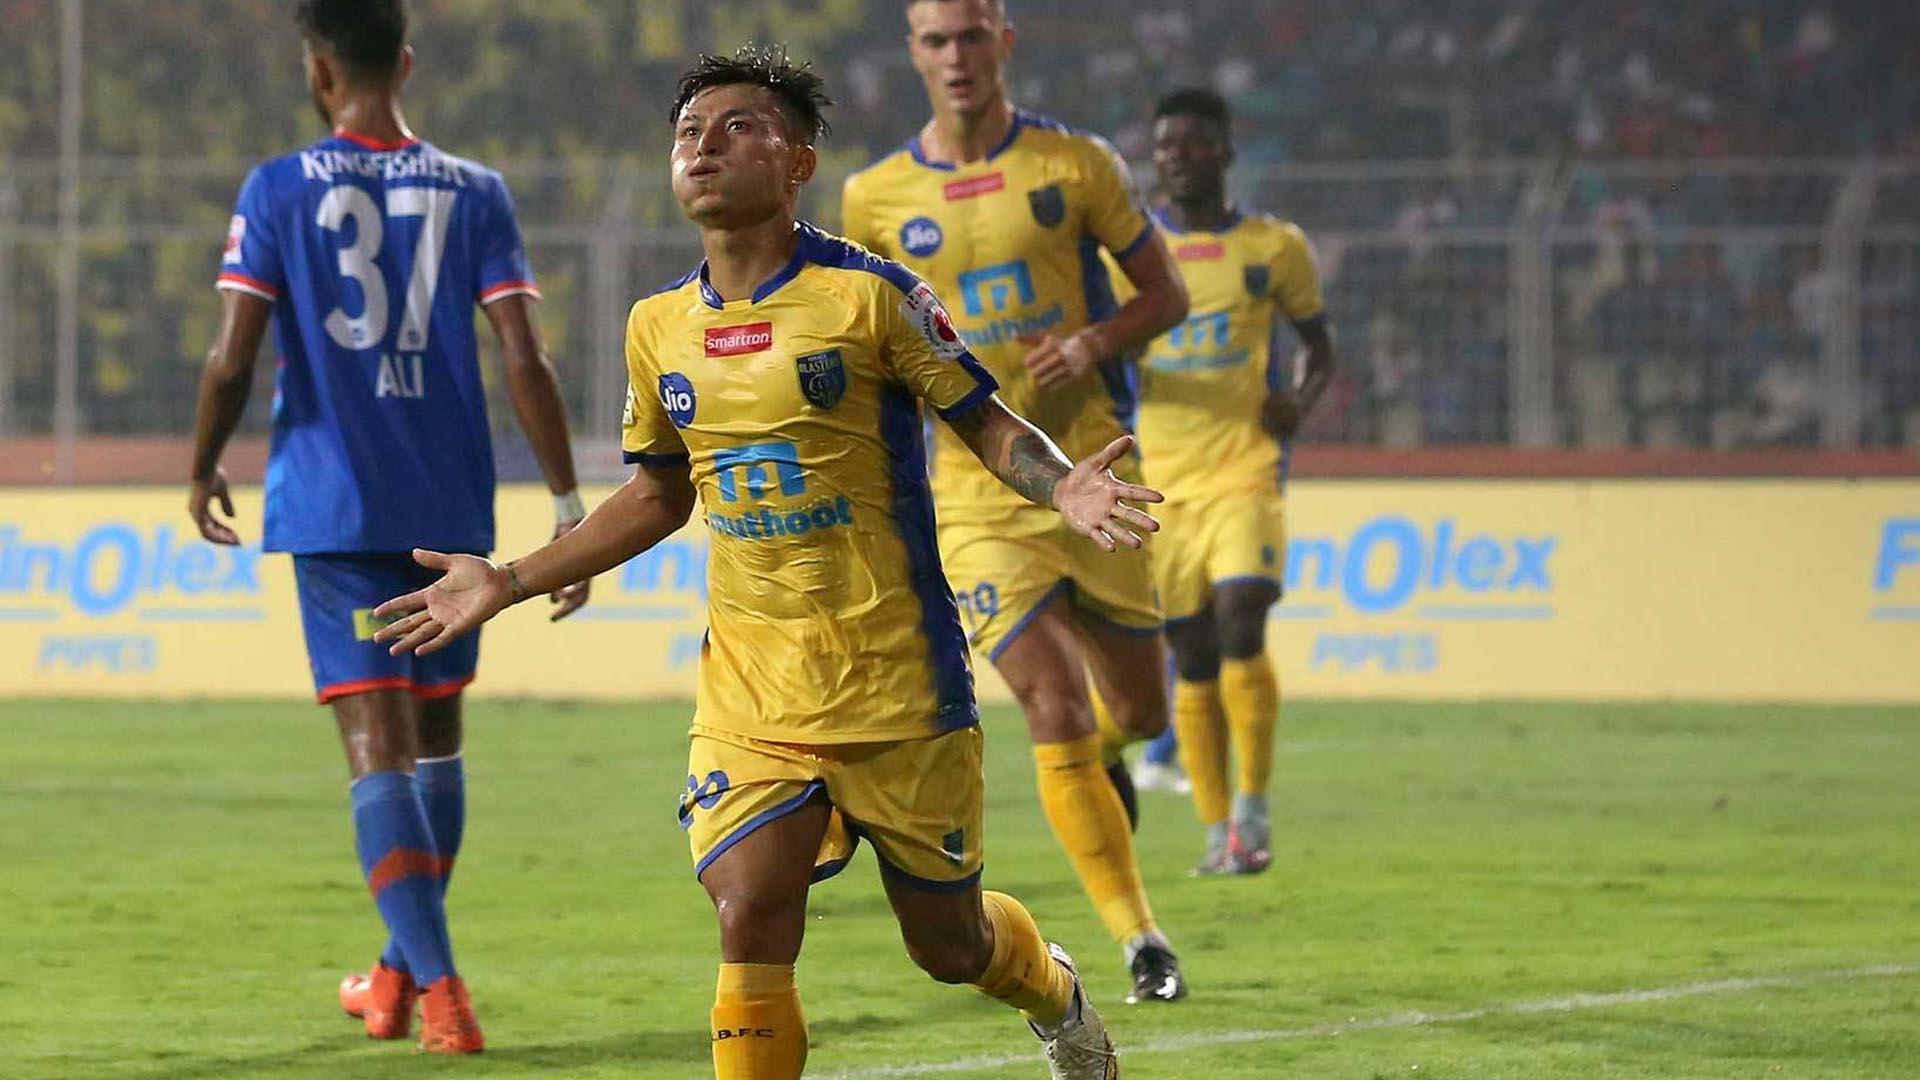 Jackichand Singh FC Goa Kerala Blasters FC ISL 4 2017/2018